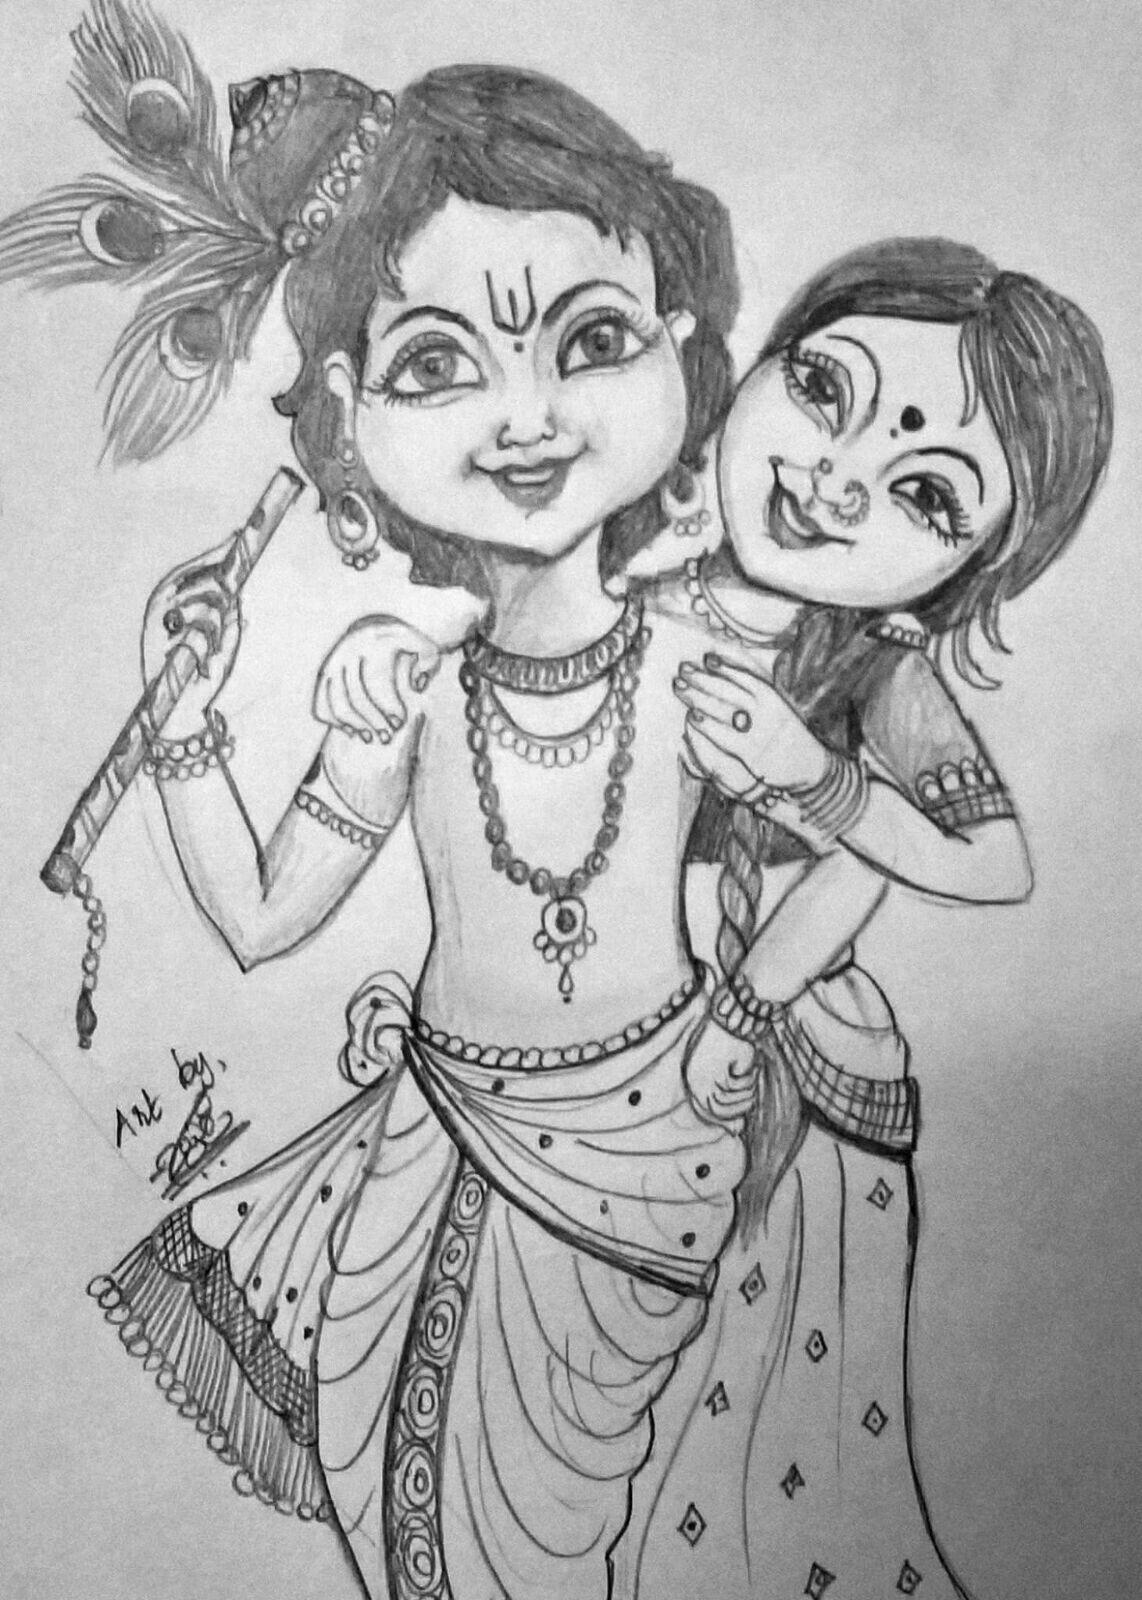 Radhakrishna❤ radha krishna love radhe krishna lord krishna radha krishna sketch